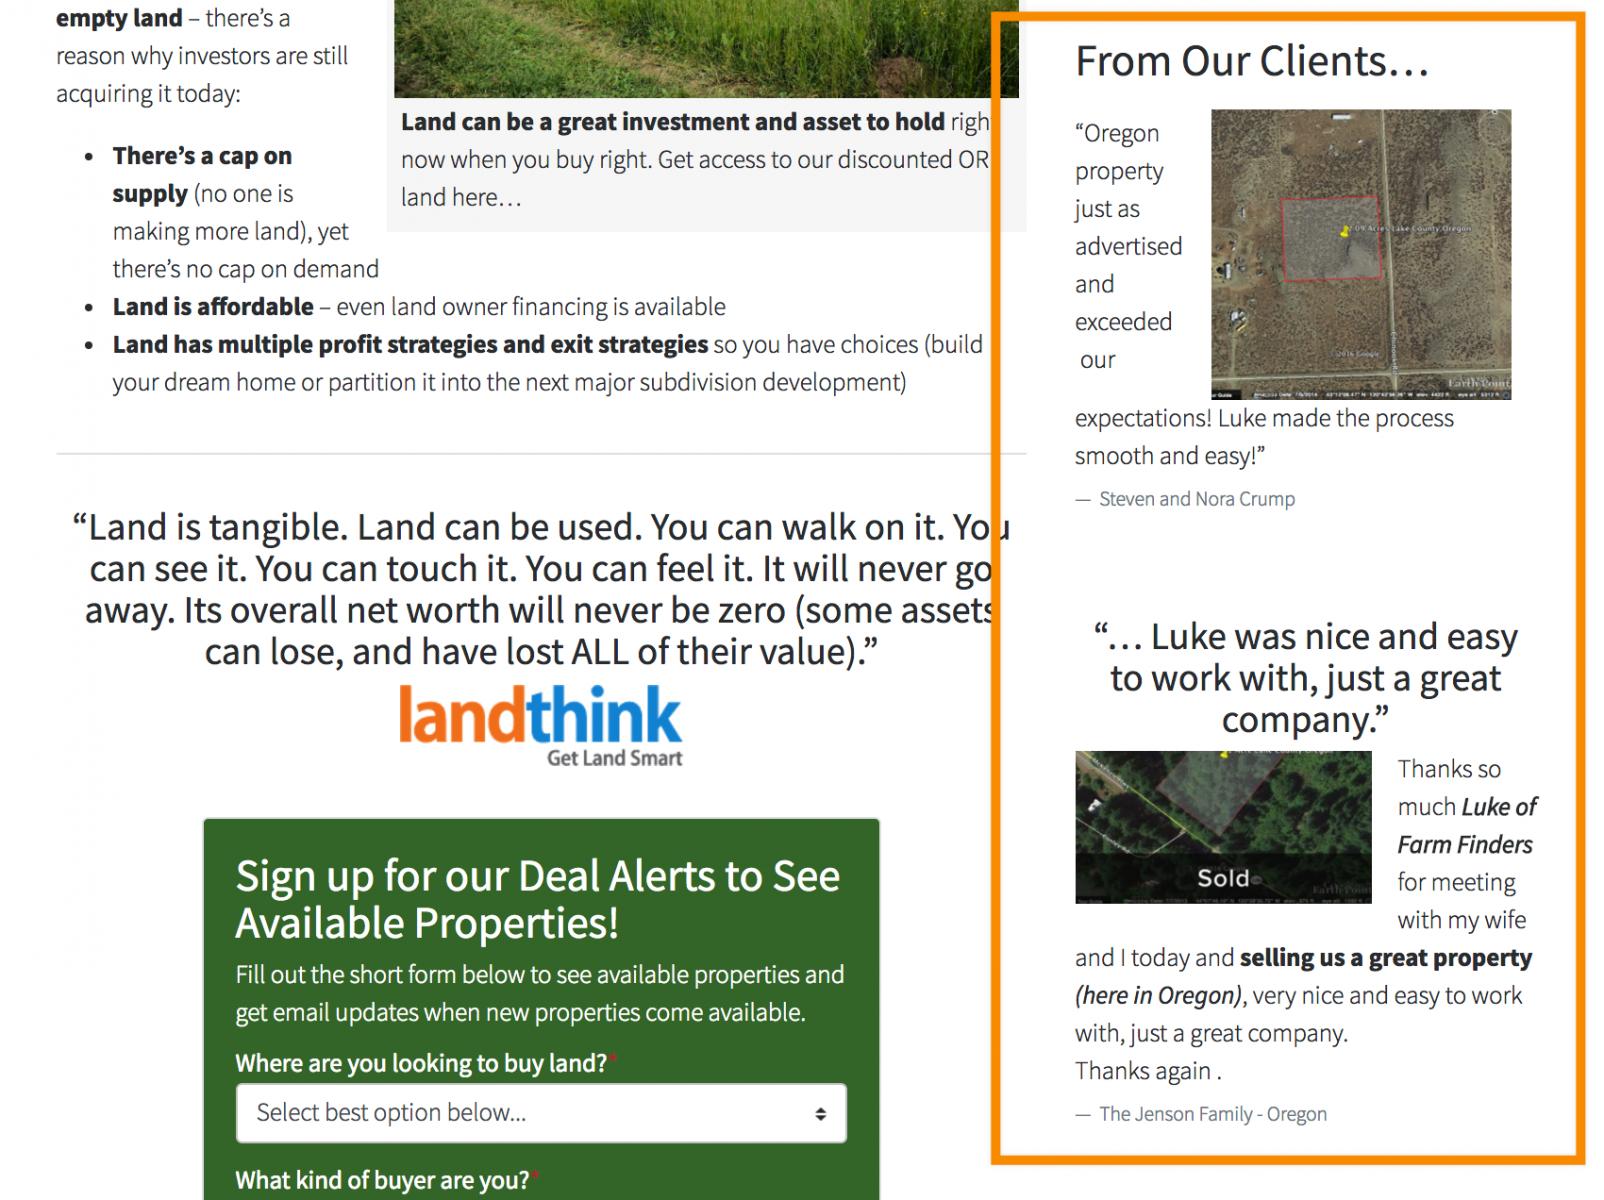 credibility score: real estate testmonials